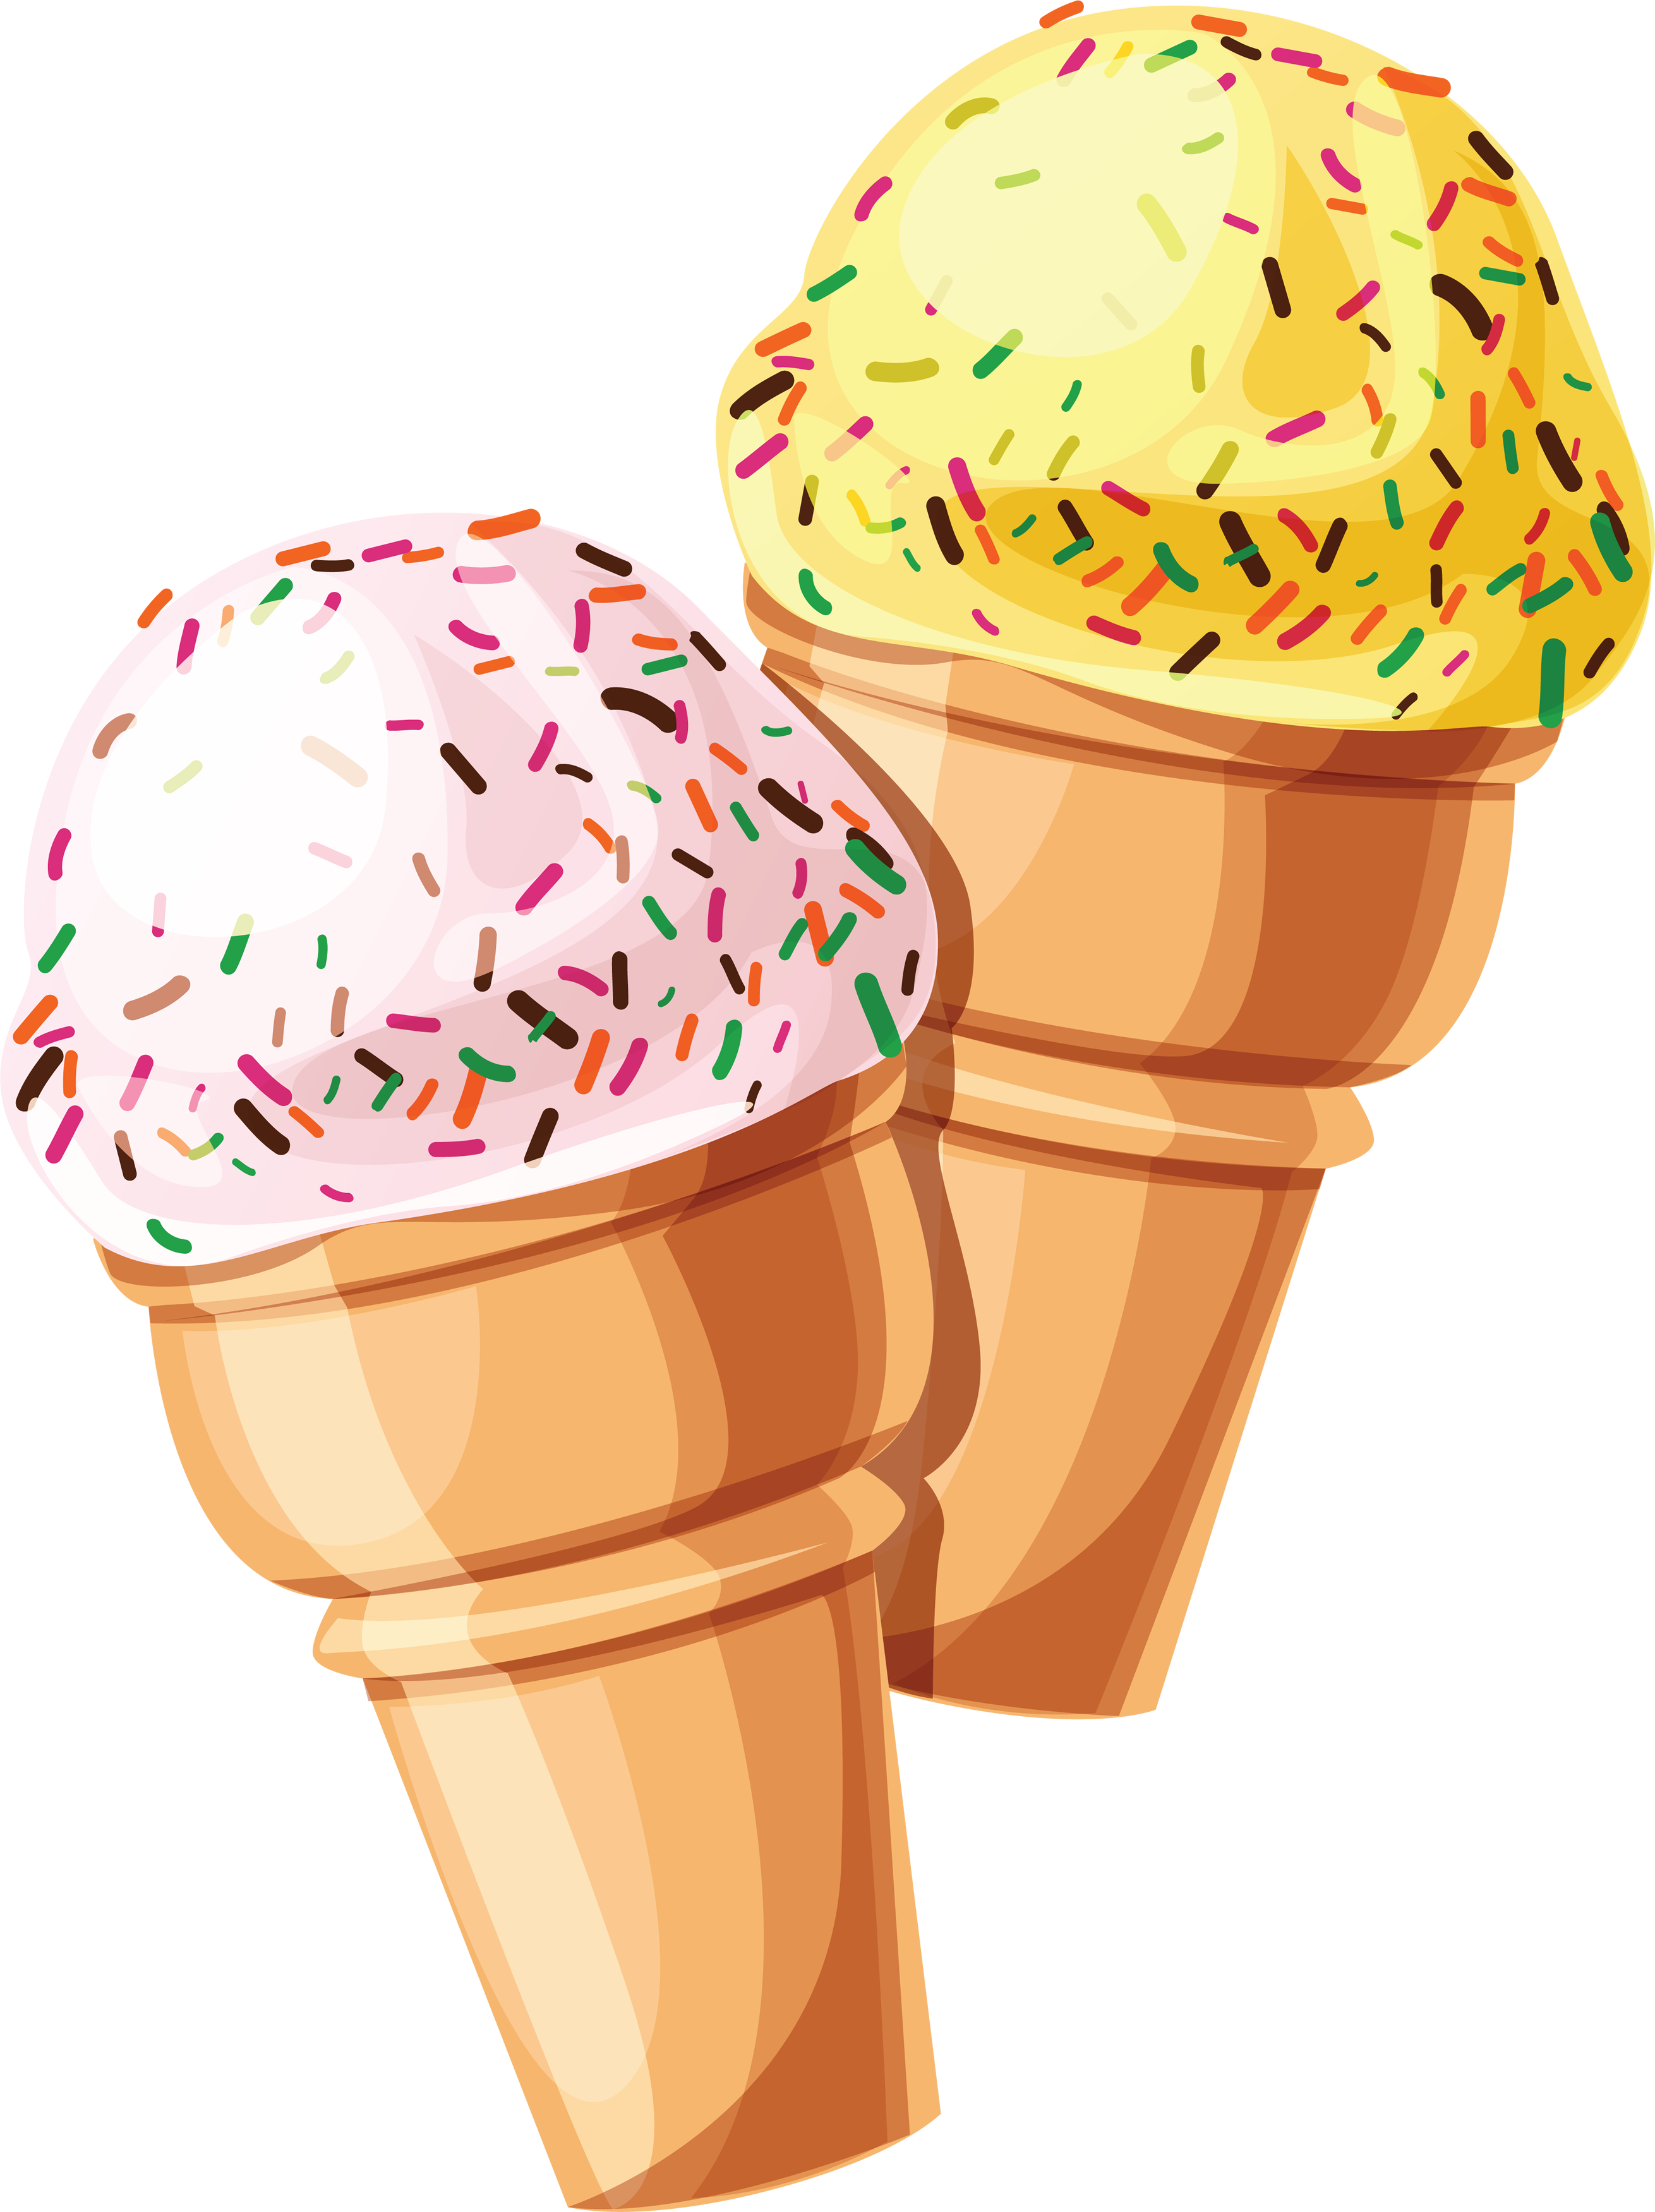 Ice cream png image. Icecream clipart kulfi